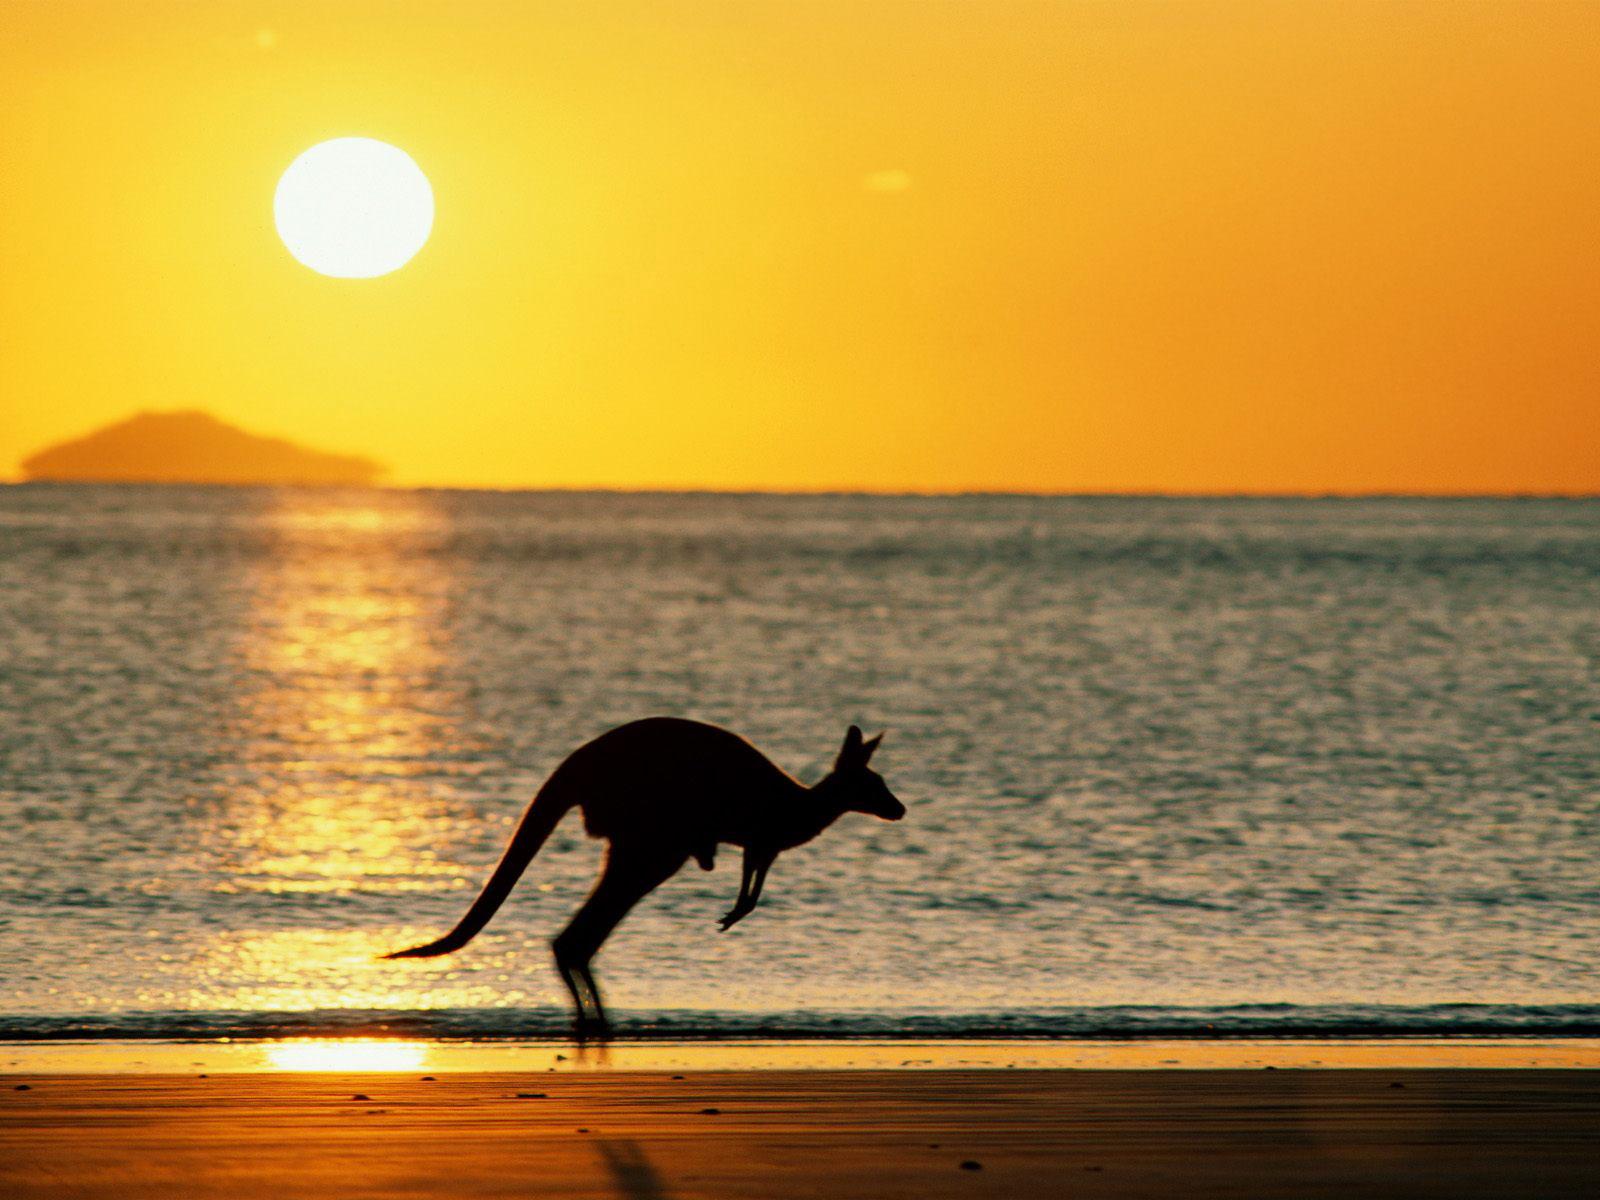 http://1.bp.blogspot.com/-SPueOzR8KMc/T-miGsh5drI/AAAAAAAADCk/ELJUrdMrmQk/s1600/Kangaroo+pictures.jpg